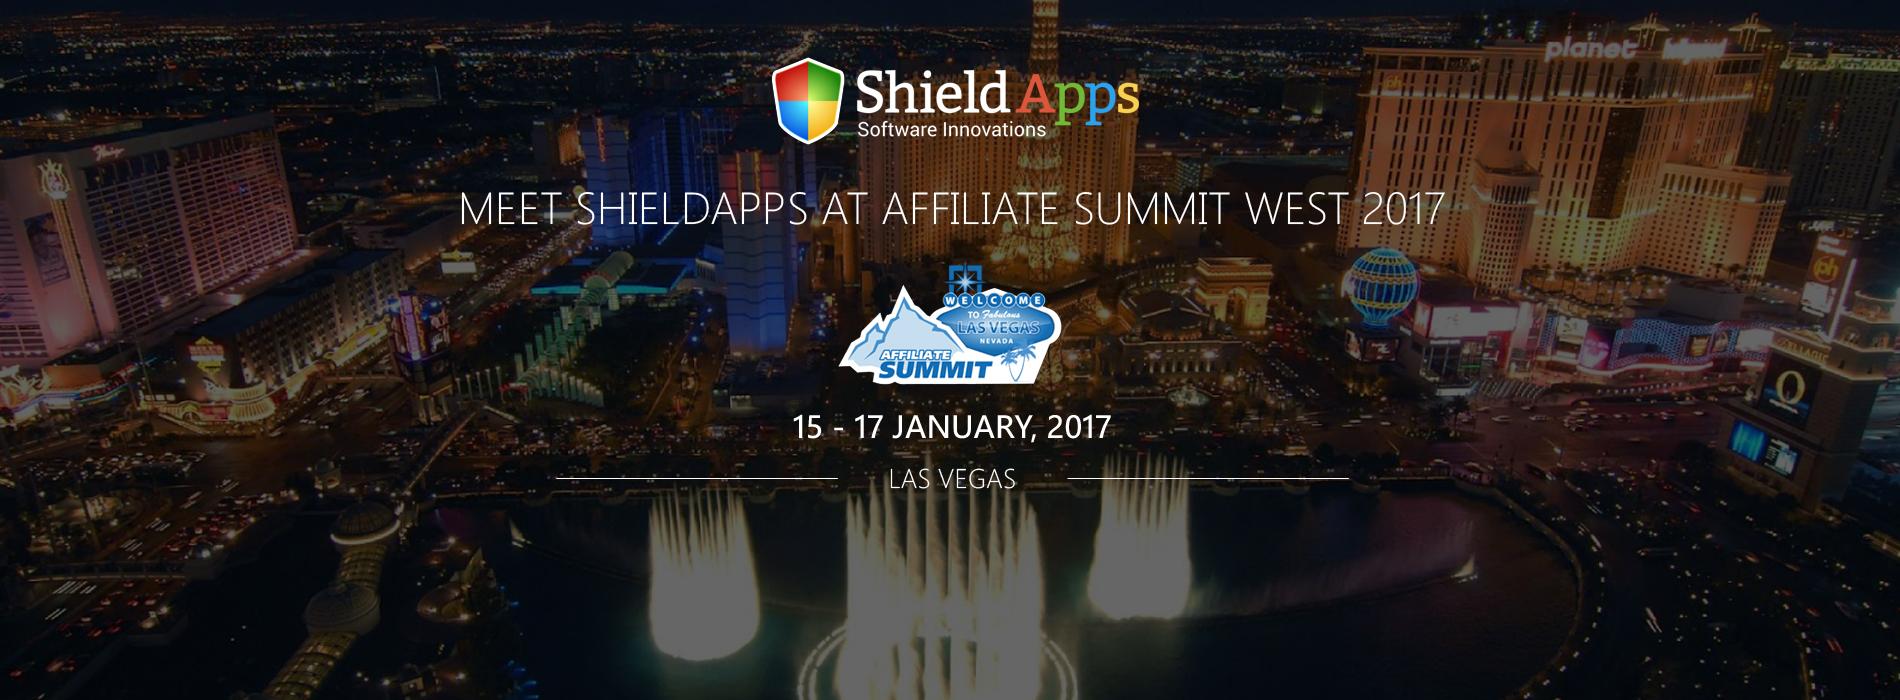 shieldapps-affiliate-banner-5